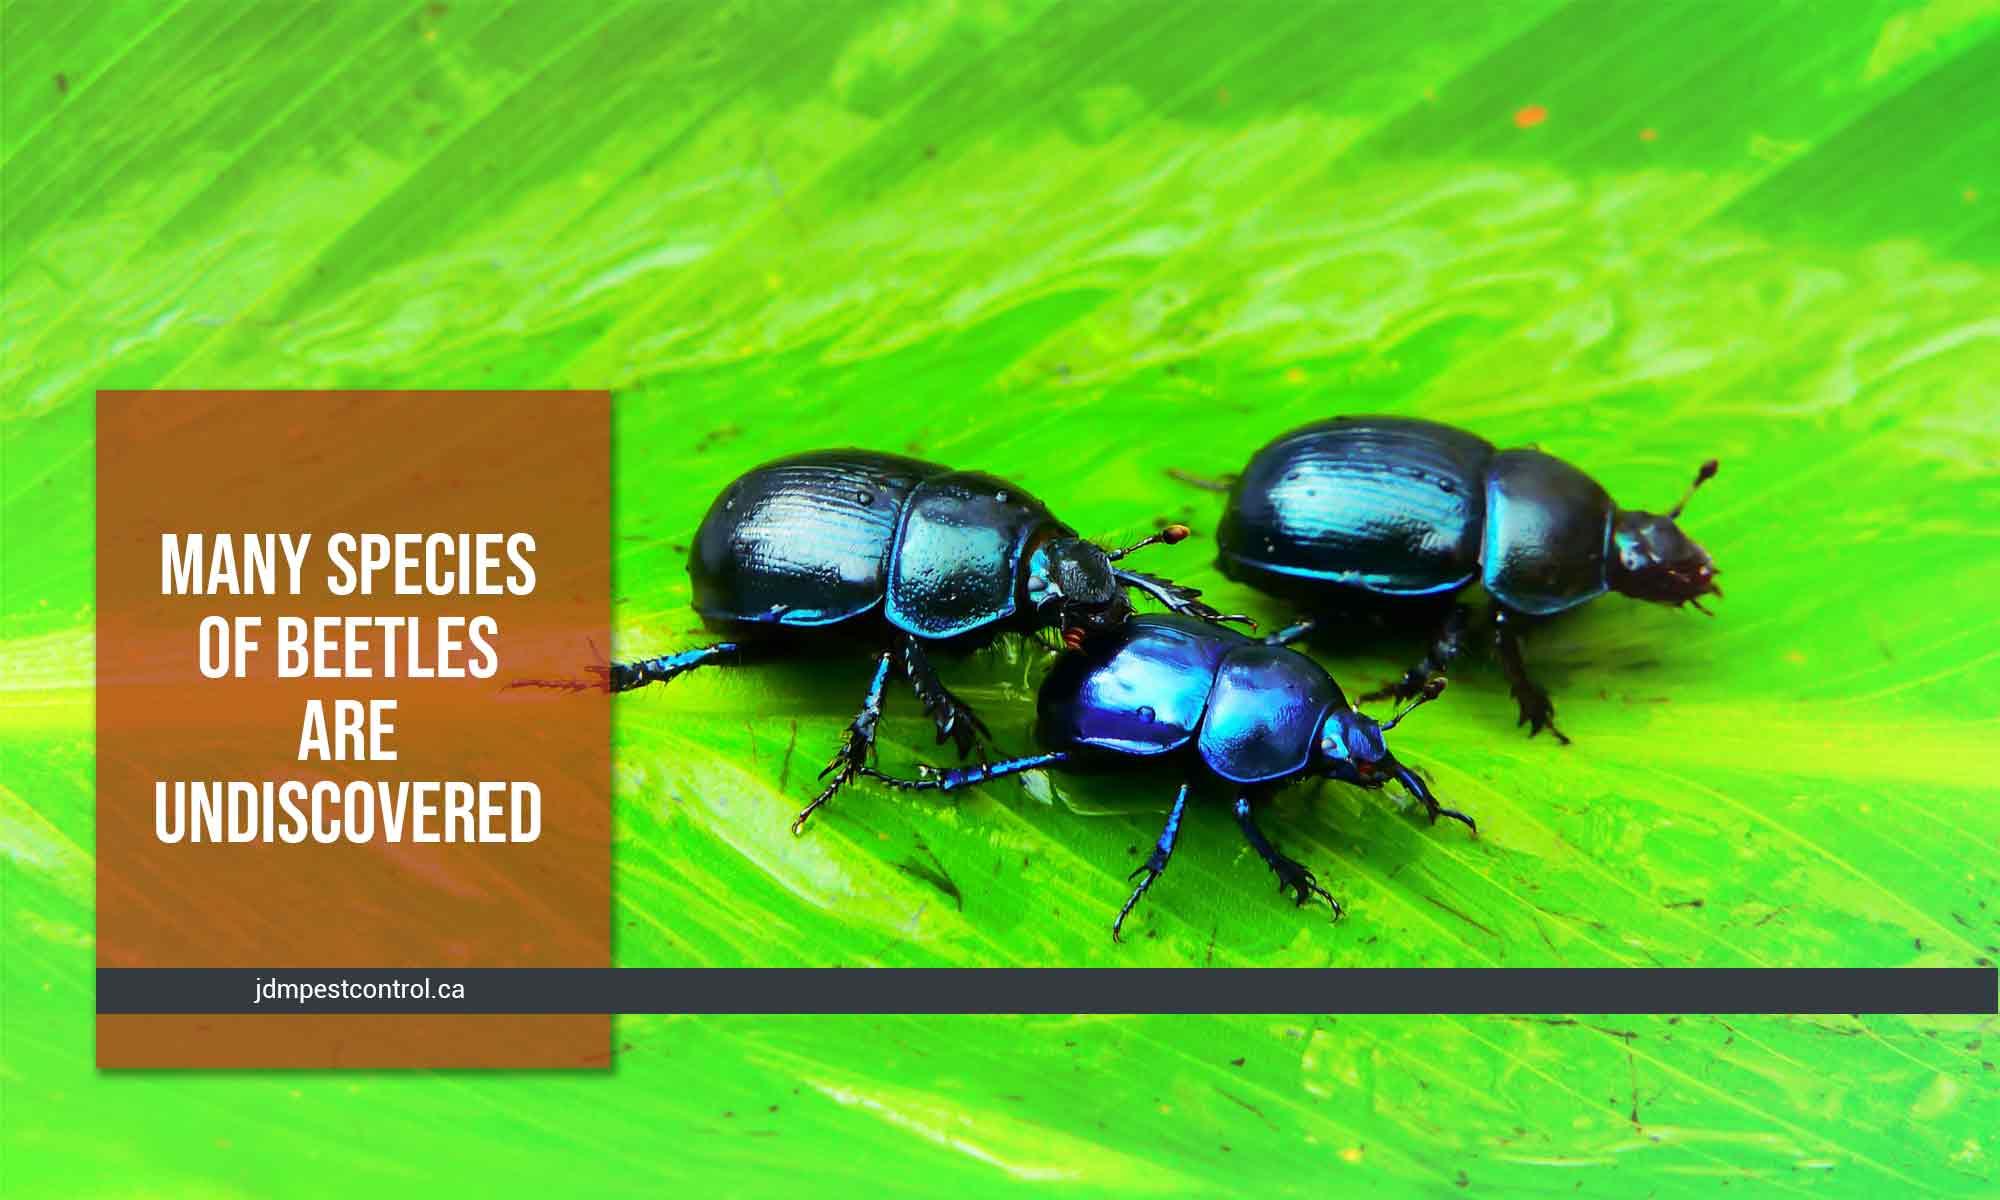 undiscovered species of beetles